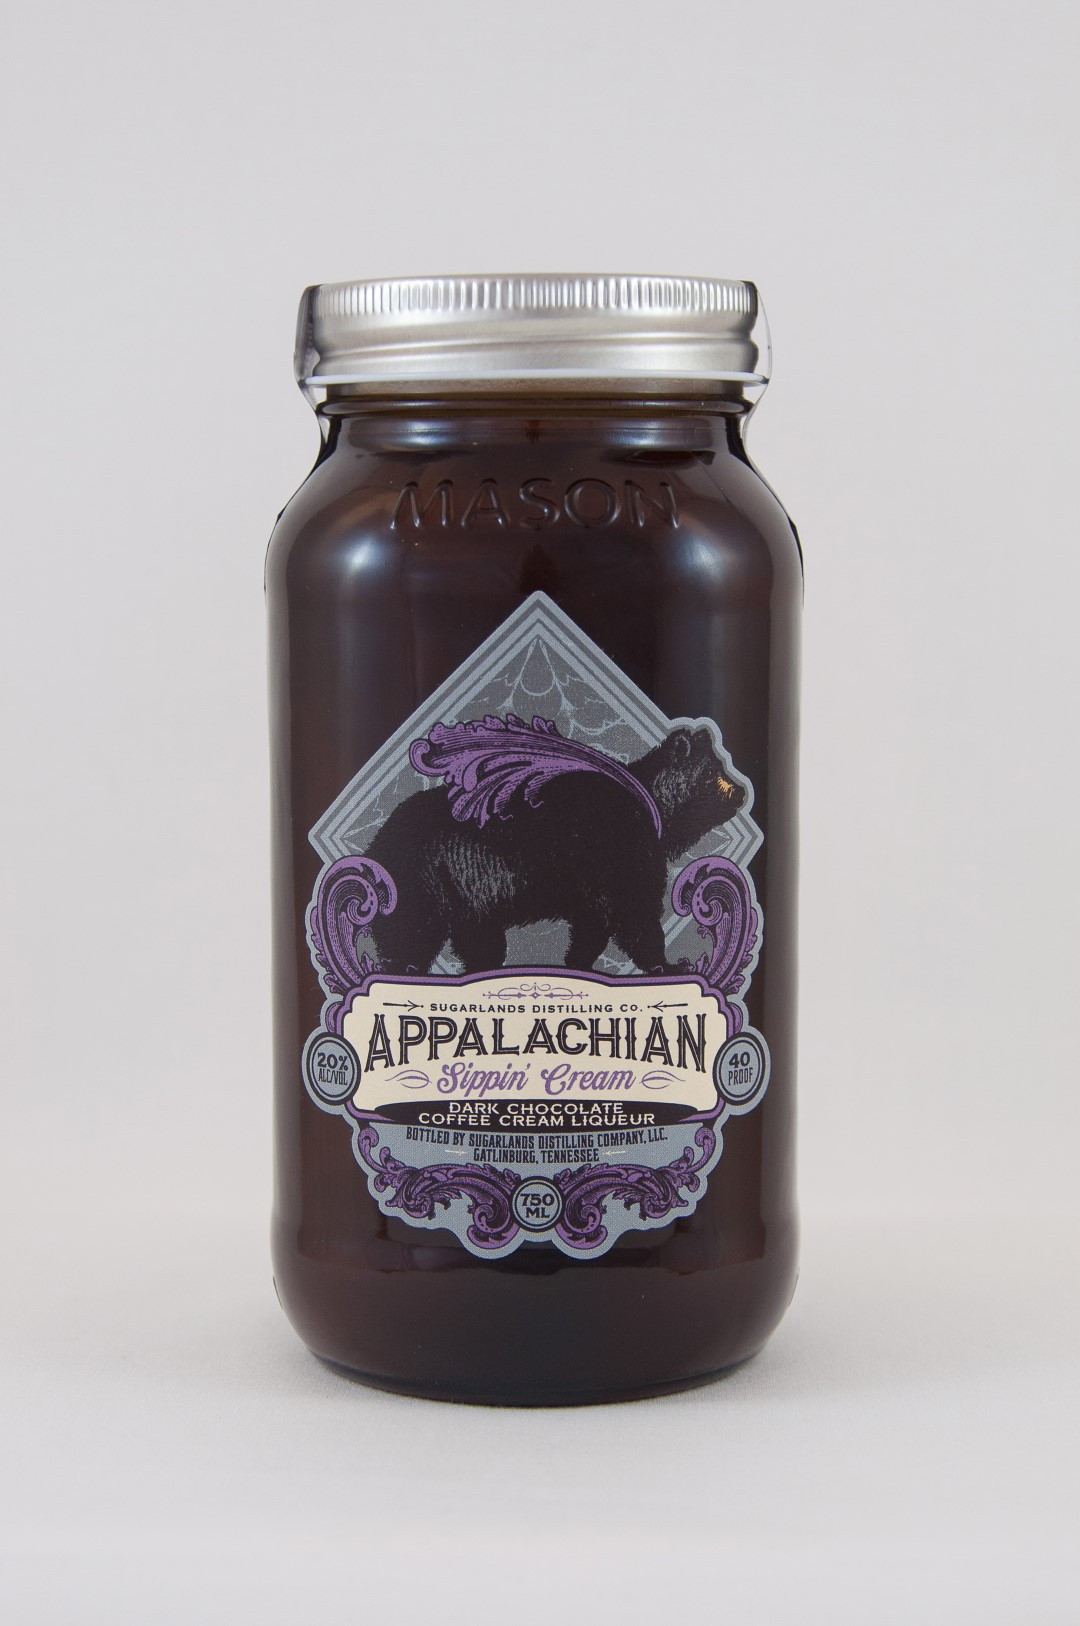 Sugarlands Appalachian Sippin' Cream Dark Chocolate Coffee Cream Liqueur